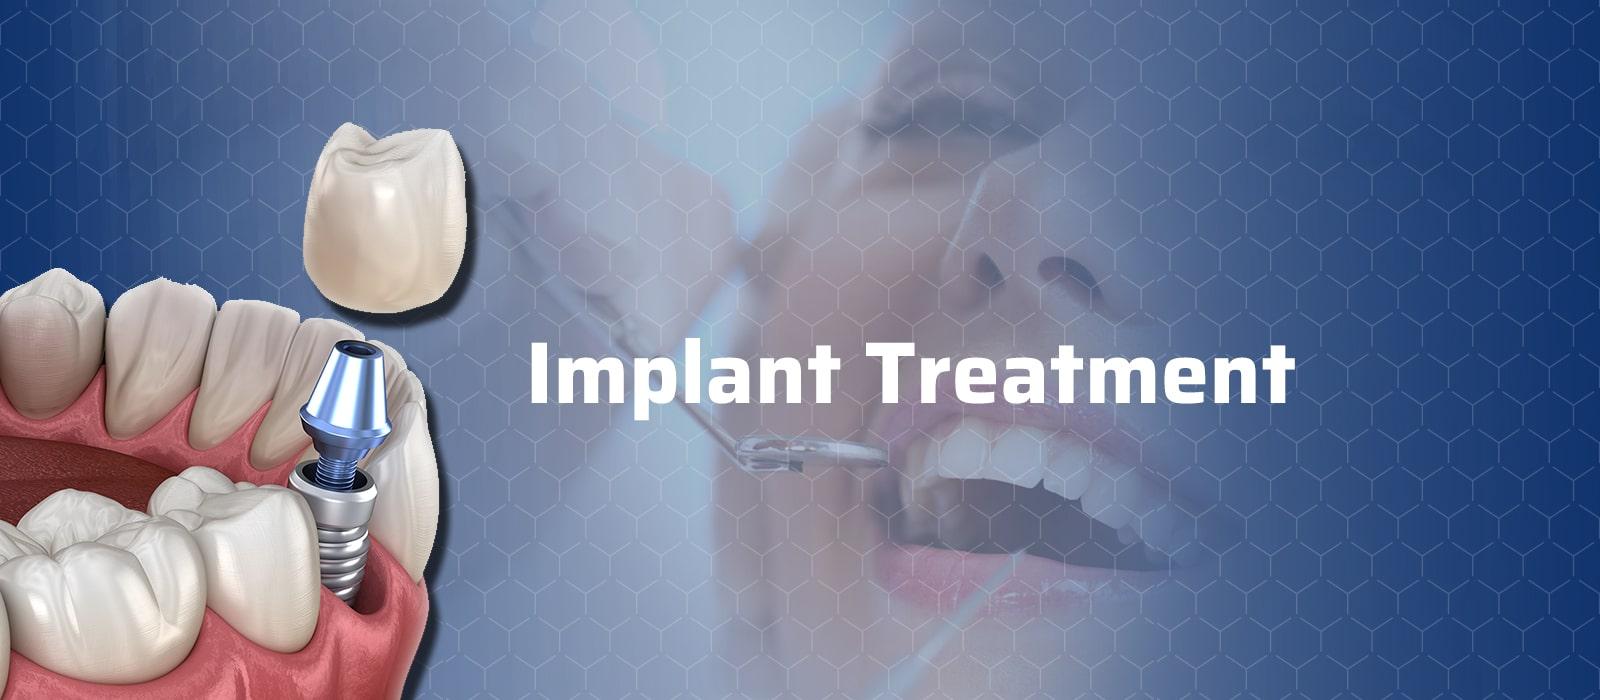 Implant Treatment